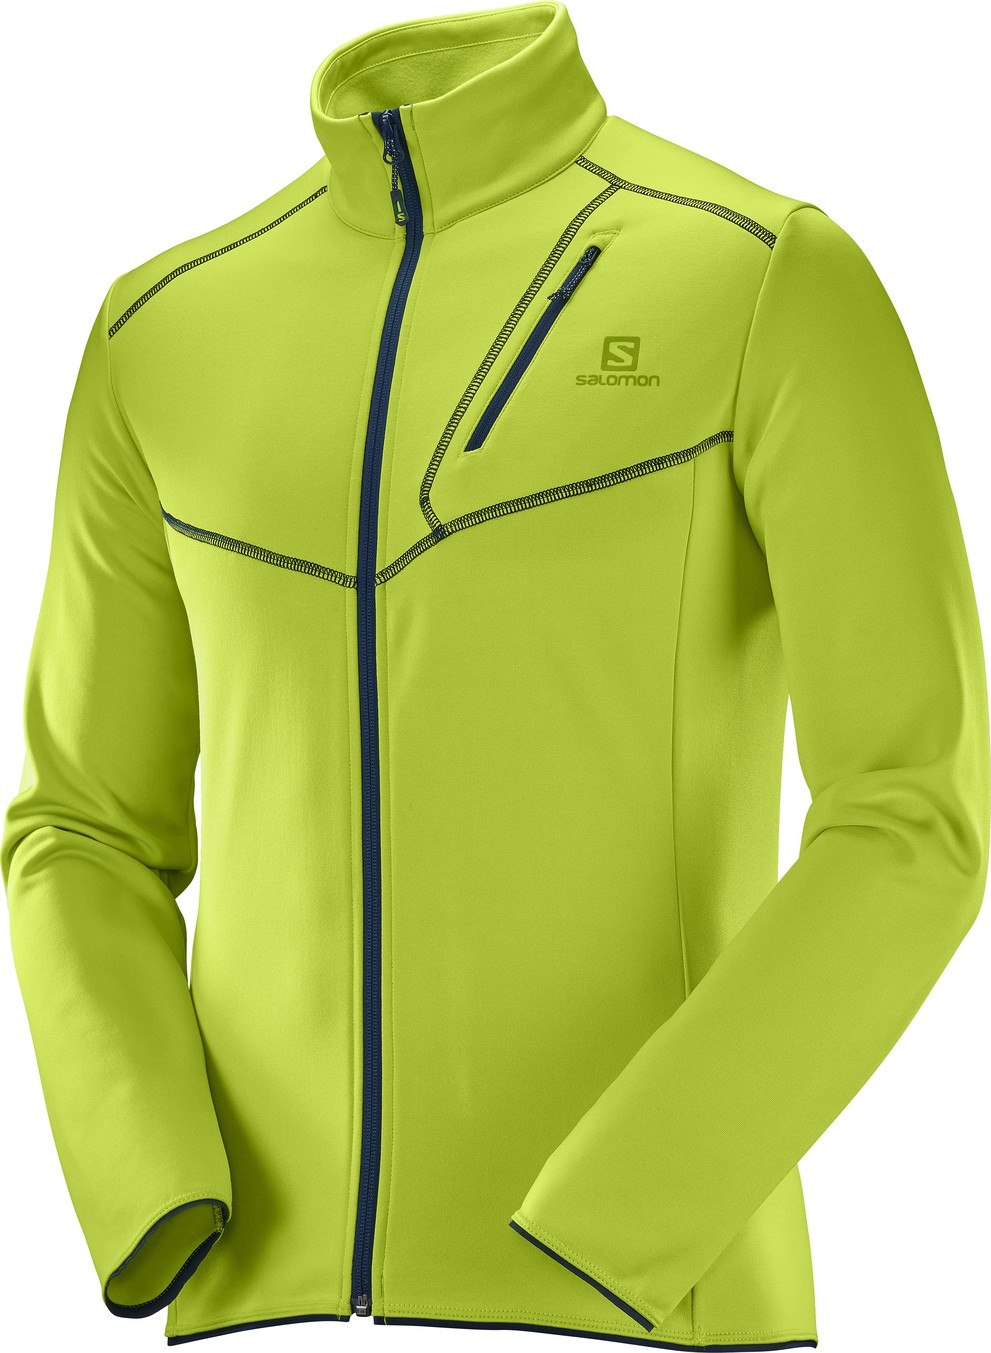 Salomon - Discovery FZ - Fleece jacket - Men's - 2017